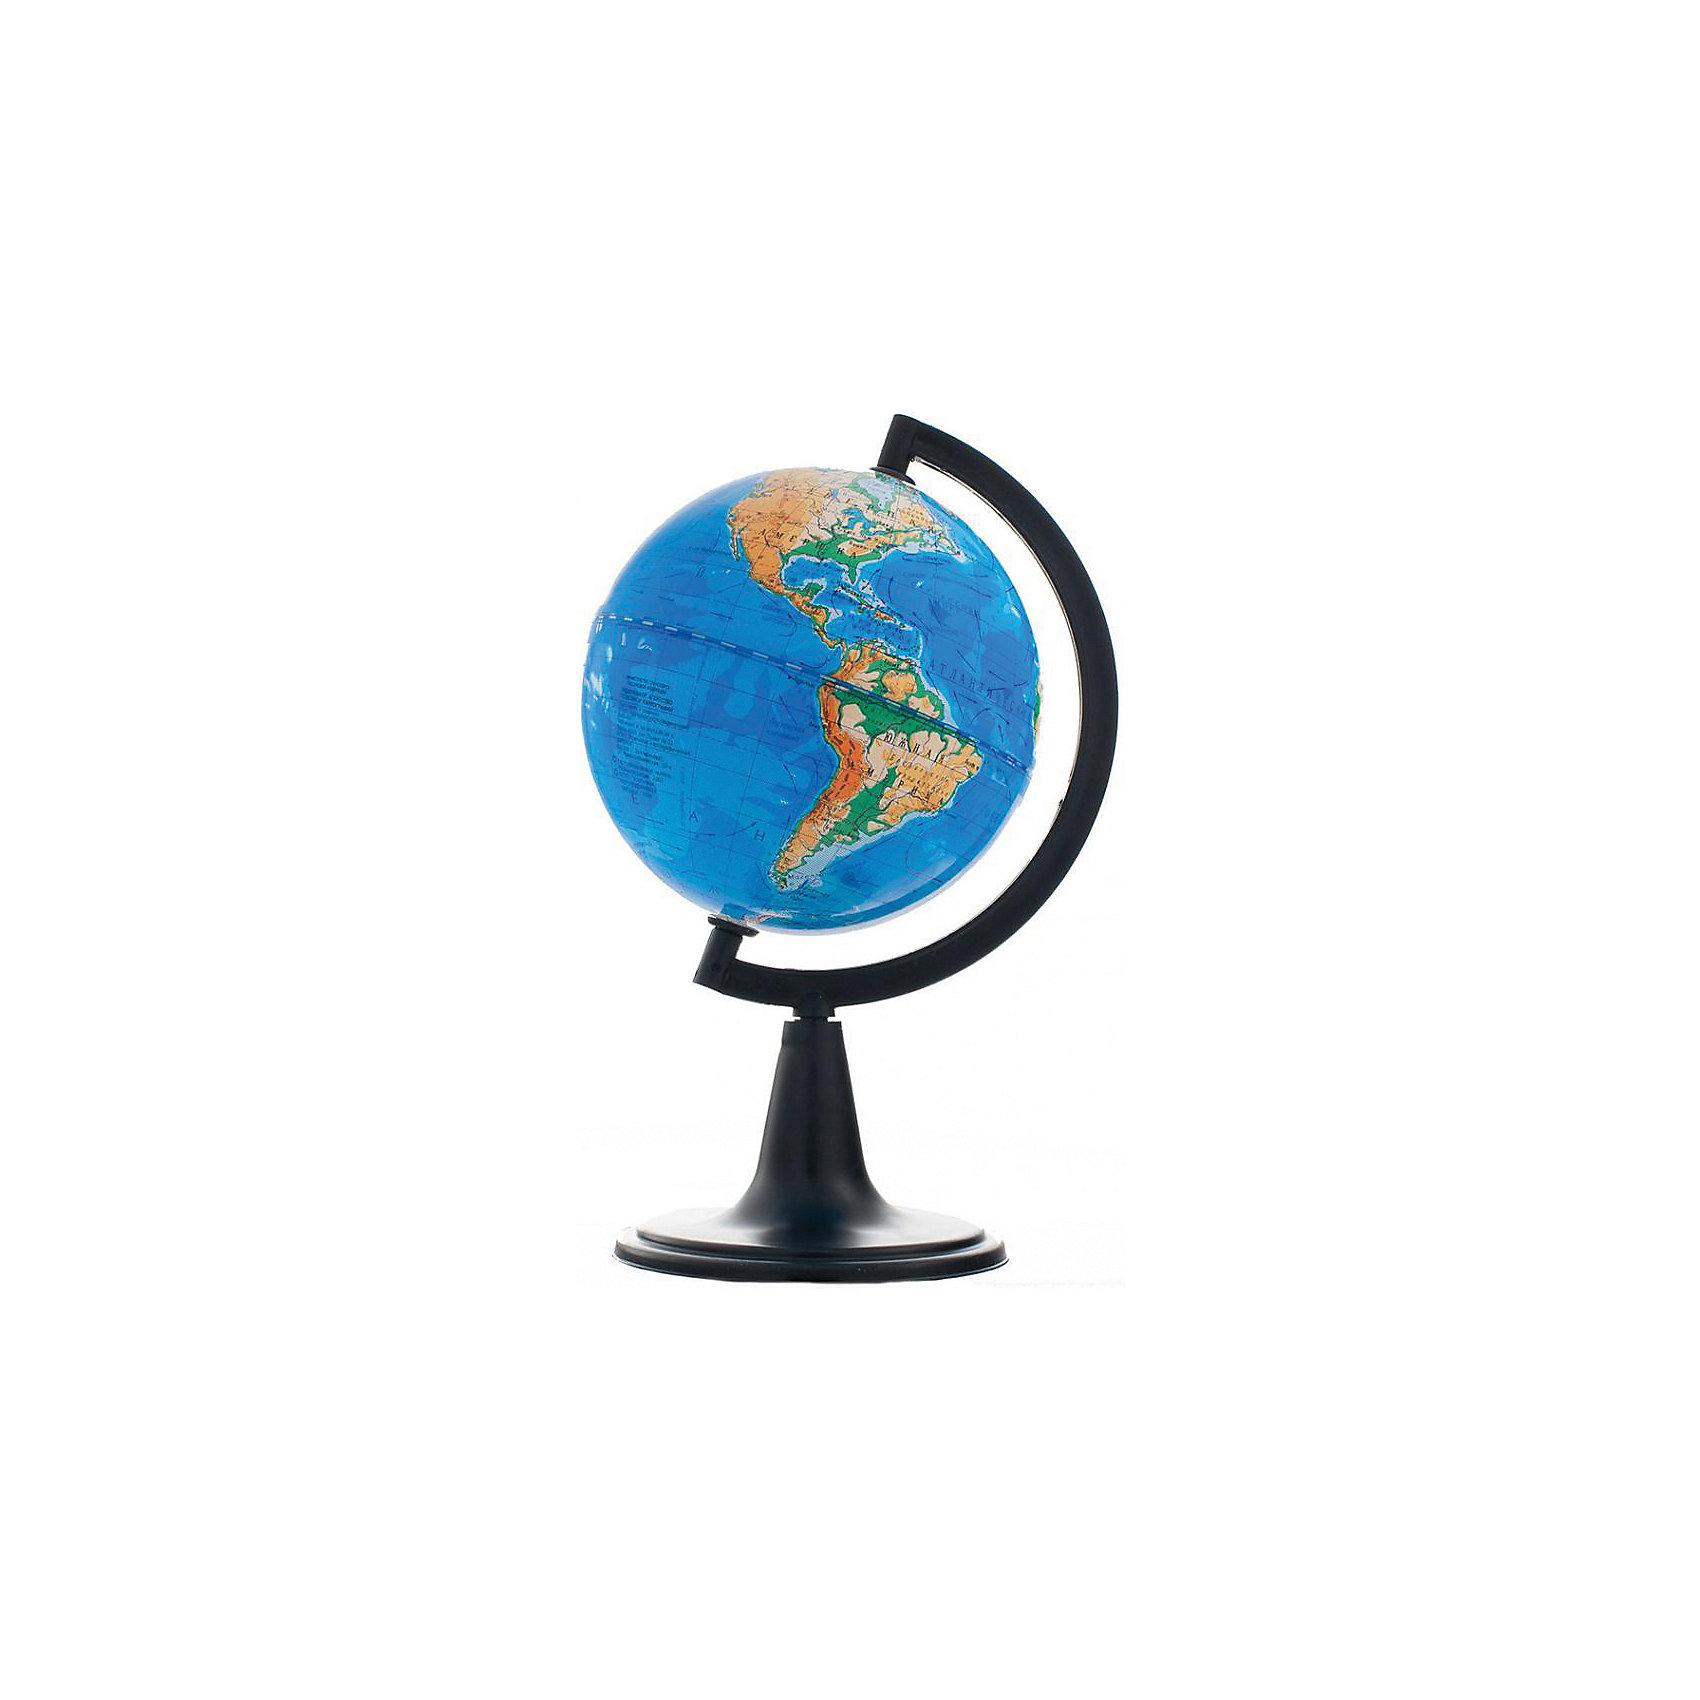 Глобус Земли физический, диаметр 120 ммДиаметр: 120 мм<br><br>Масштаб: 1:106000000<br><br>Материал подставки: Пластик<br><br>Цвет подставки: Черный<br><br>Ширина мм: 468<br>Глубина мм: 468<br>Высота мм: 435<br>Вес г: 180<br>Возраст от месяцев: 72<br>Возраст до месяцев: 2147483647<br>Пол: Унисекс<br>Возраст: Детский<br>SKU: 5518211